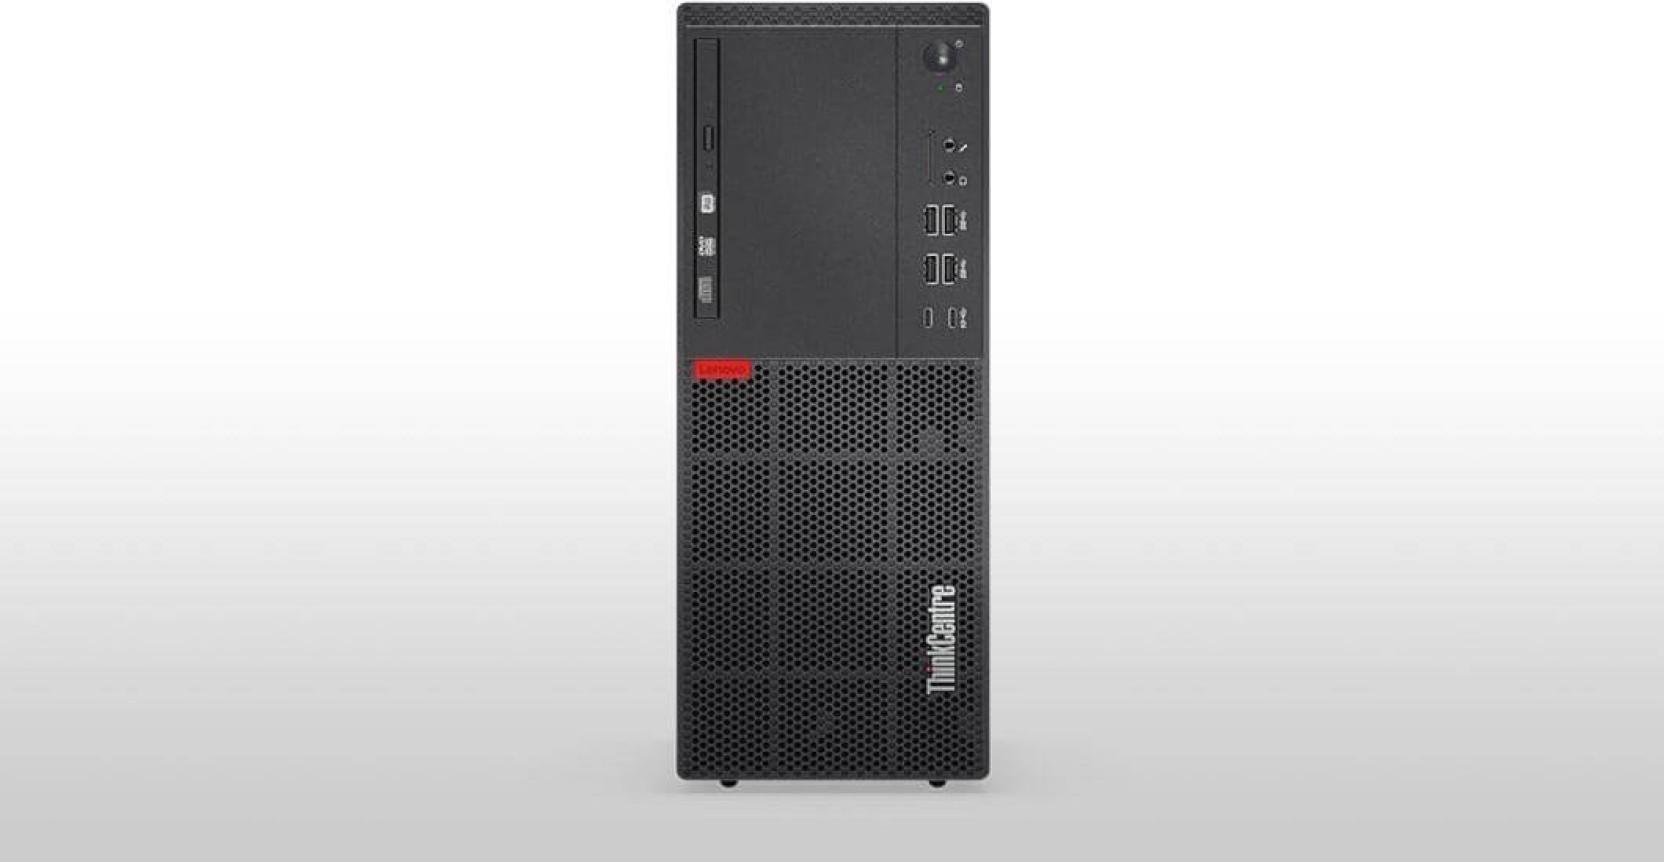 Lenovo ThinkCentre M710 Mini Tower with i5 4 GB RAM 1 TB